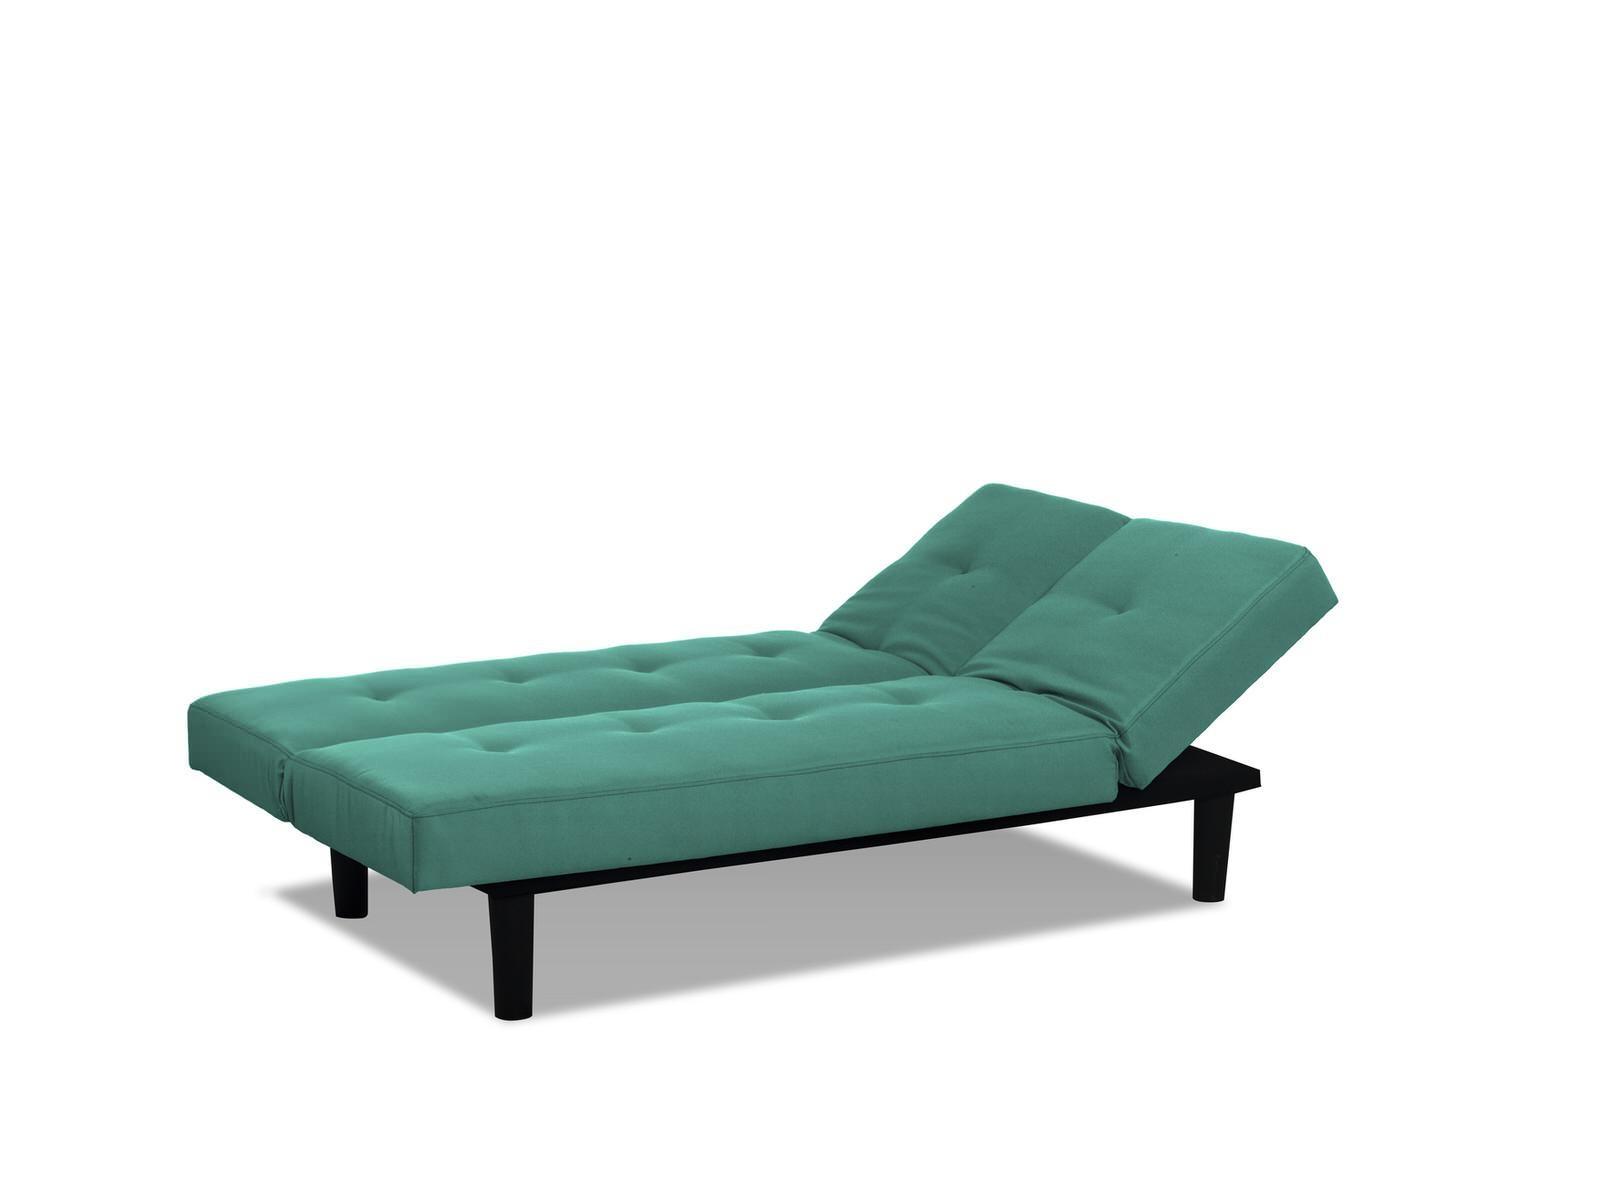 Mini Lounger Convertible Sofa Bed Tealserta / Lifestyle Inside Mini Sofa Beds (Image 9 of 20)